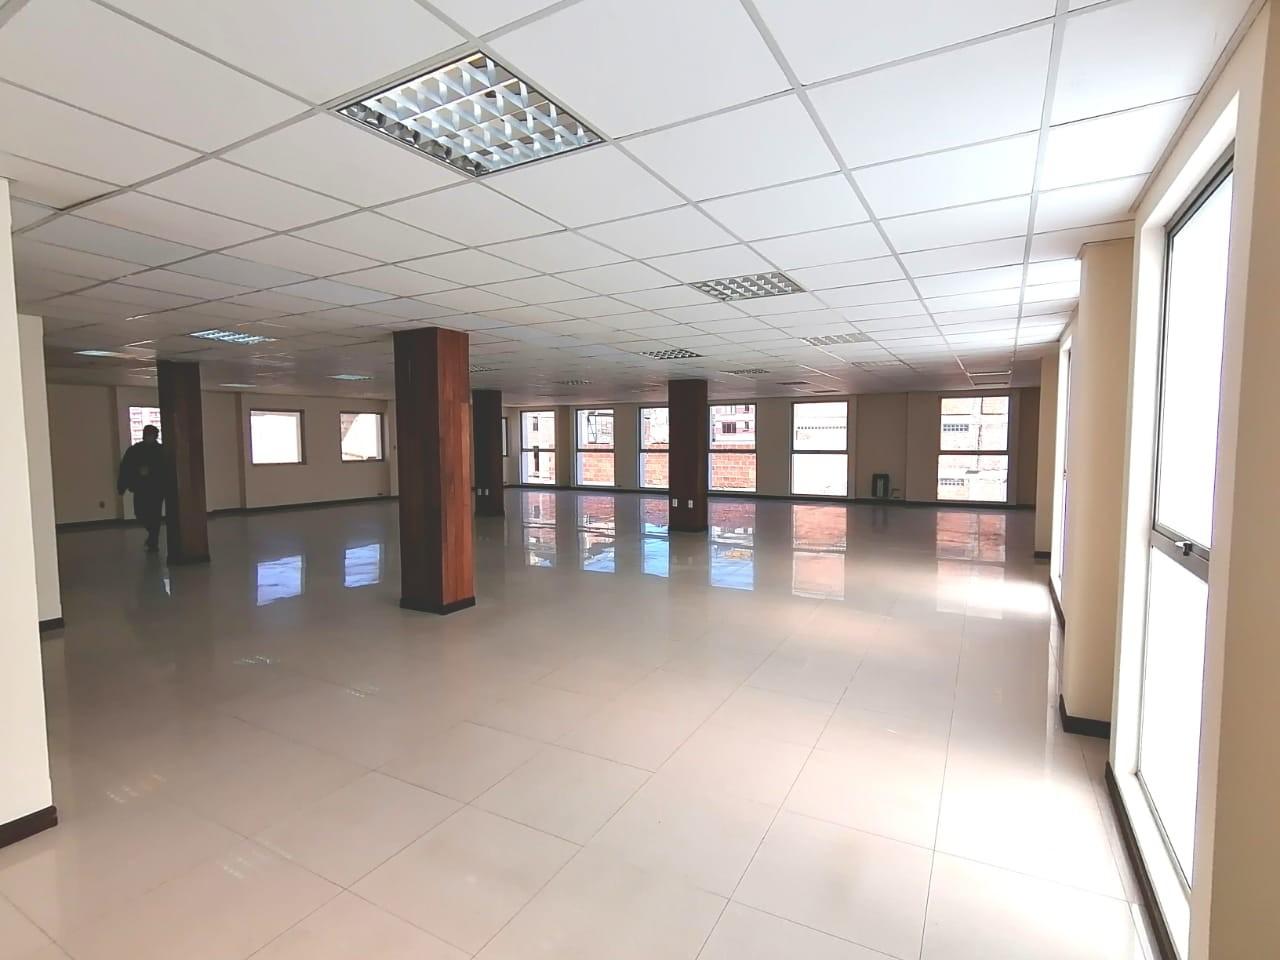 Oficina en Alquiler OFICINA EN ALQUILER 300 mtrs  CALLE SUCRE Foto 5